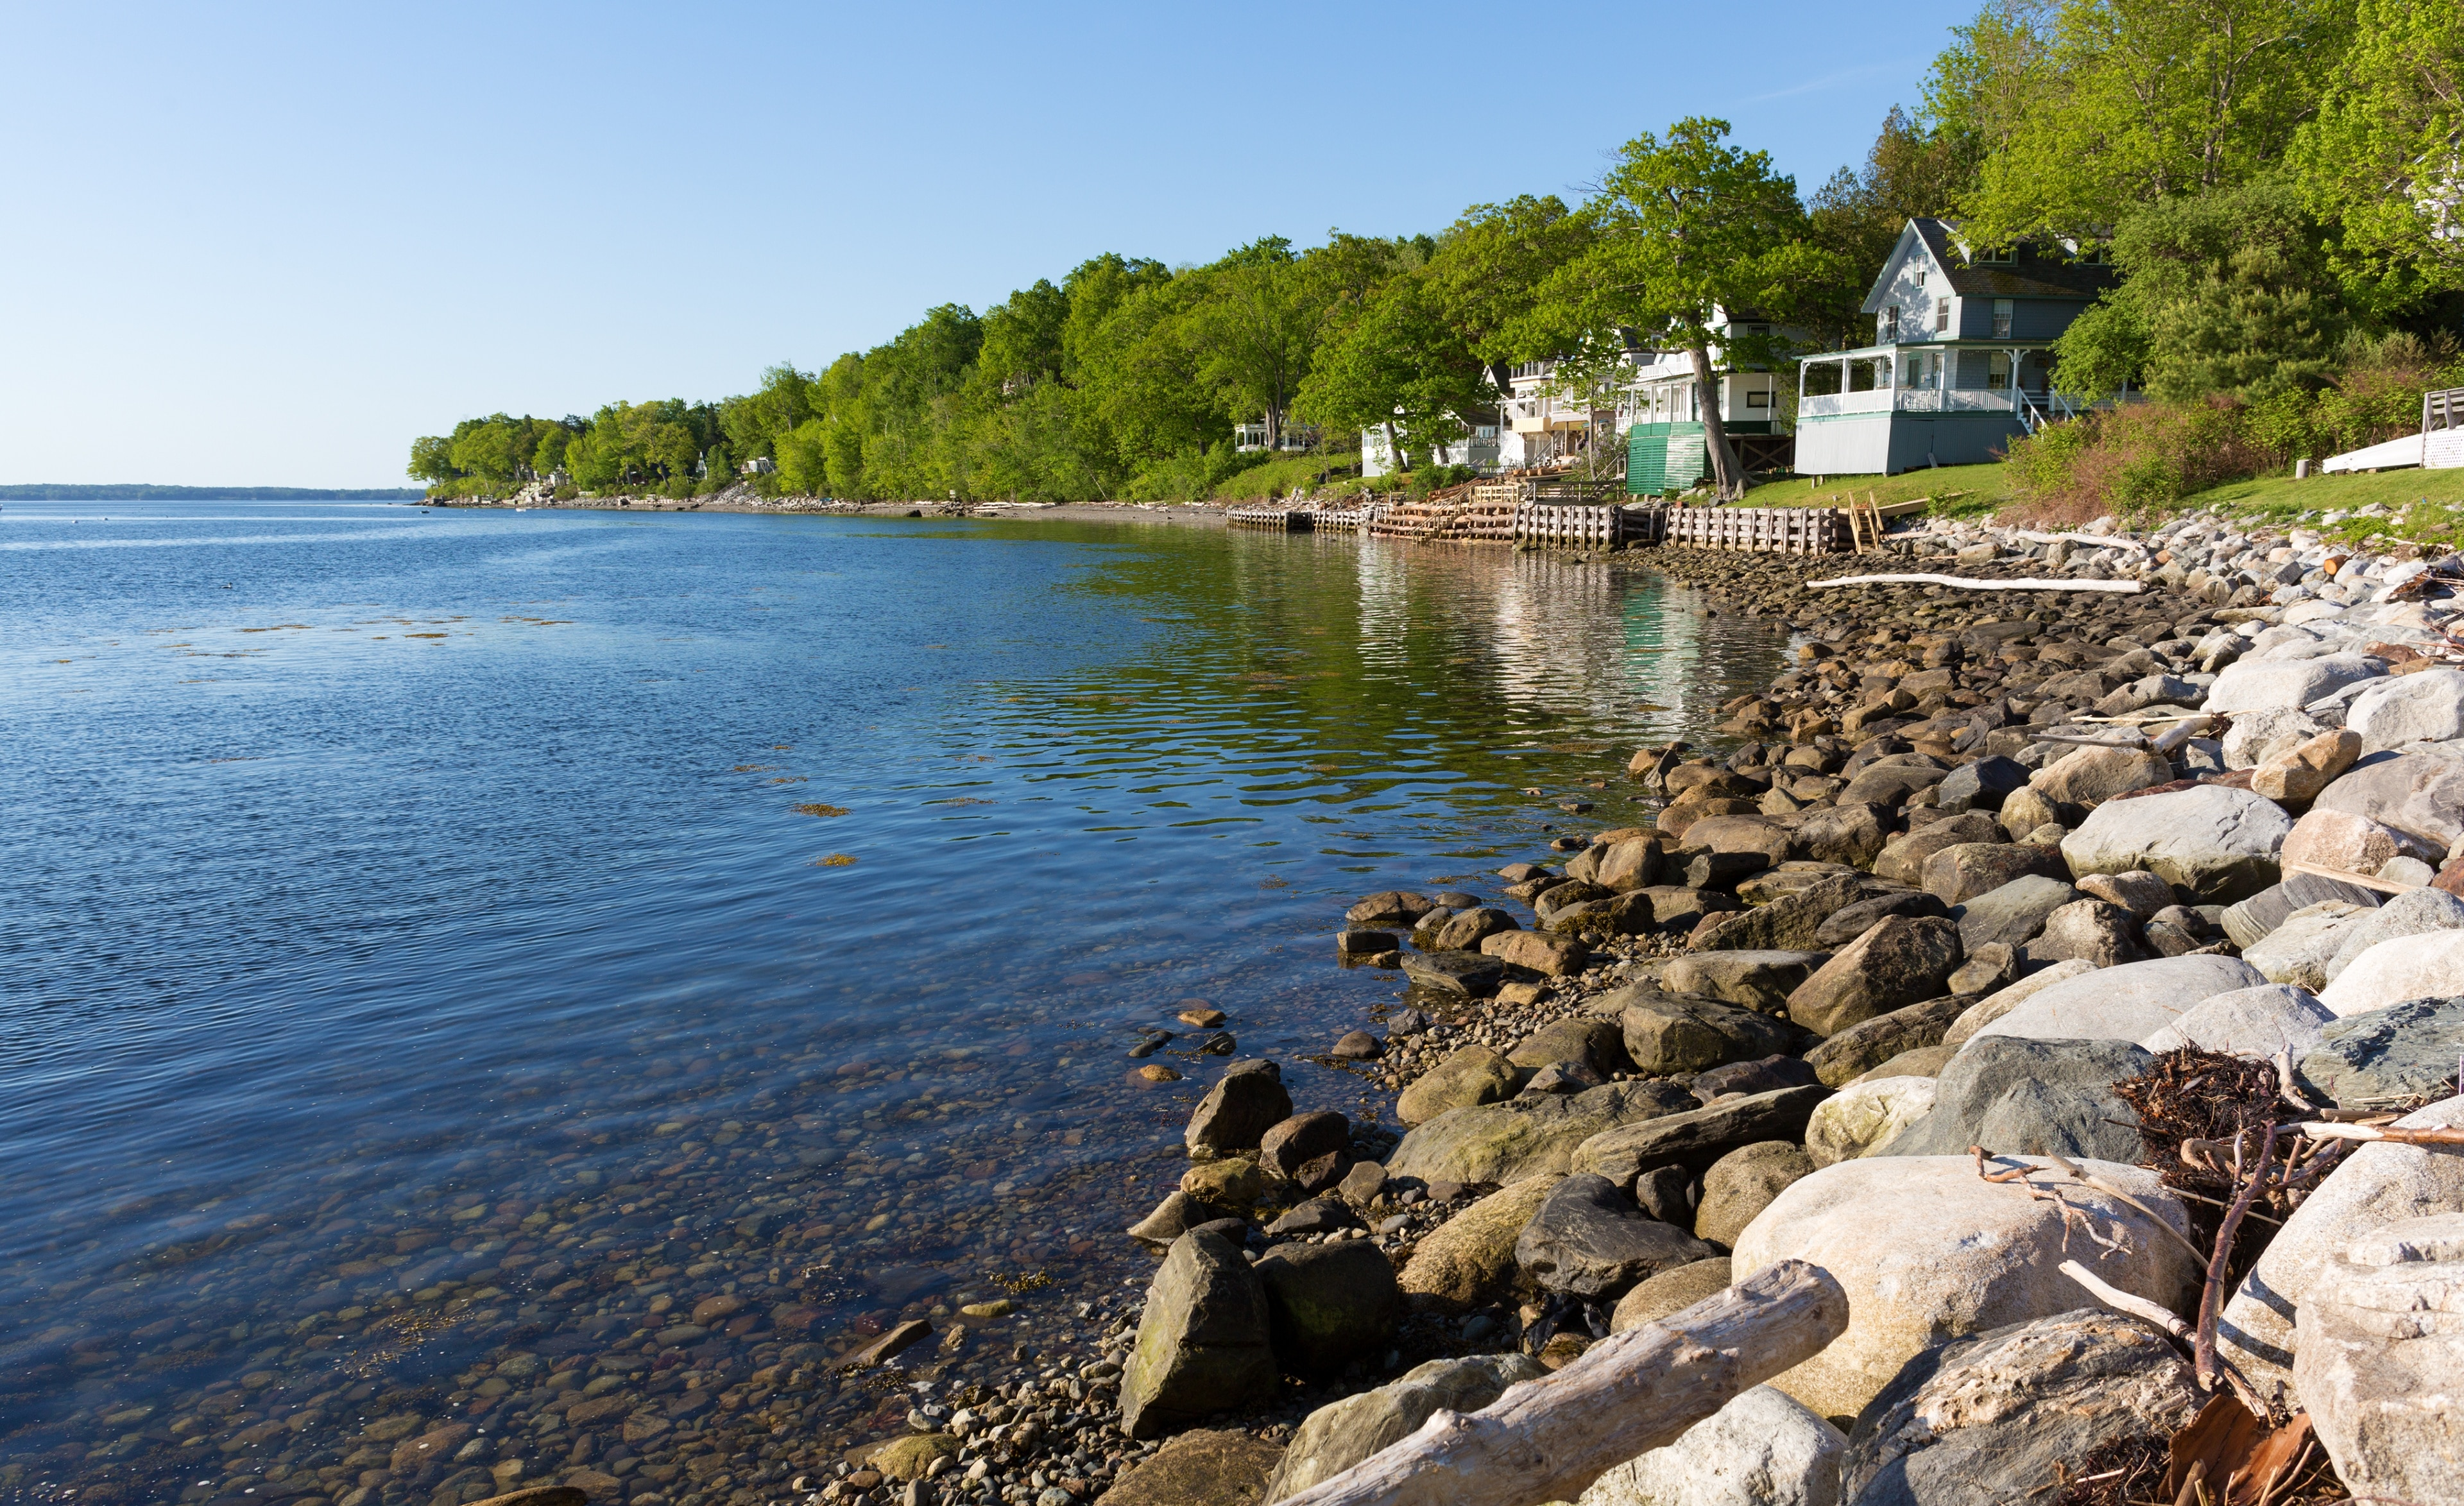 Penobscot, Maine, United States of America